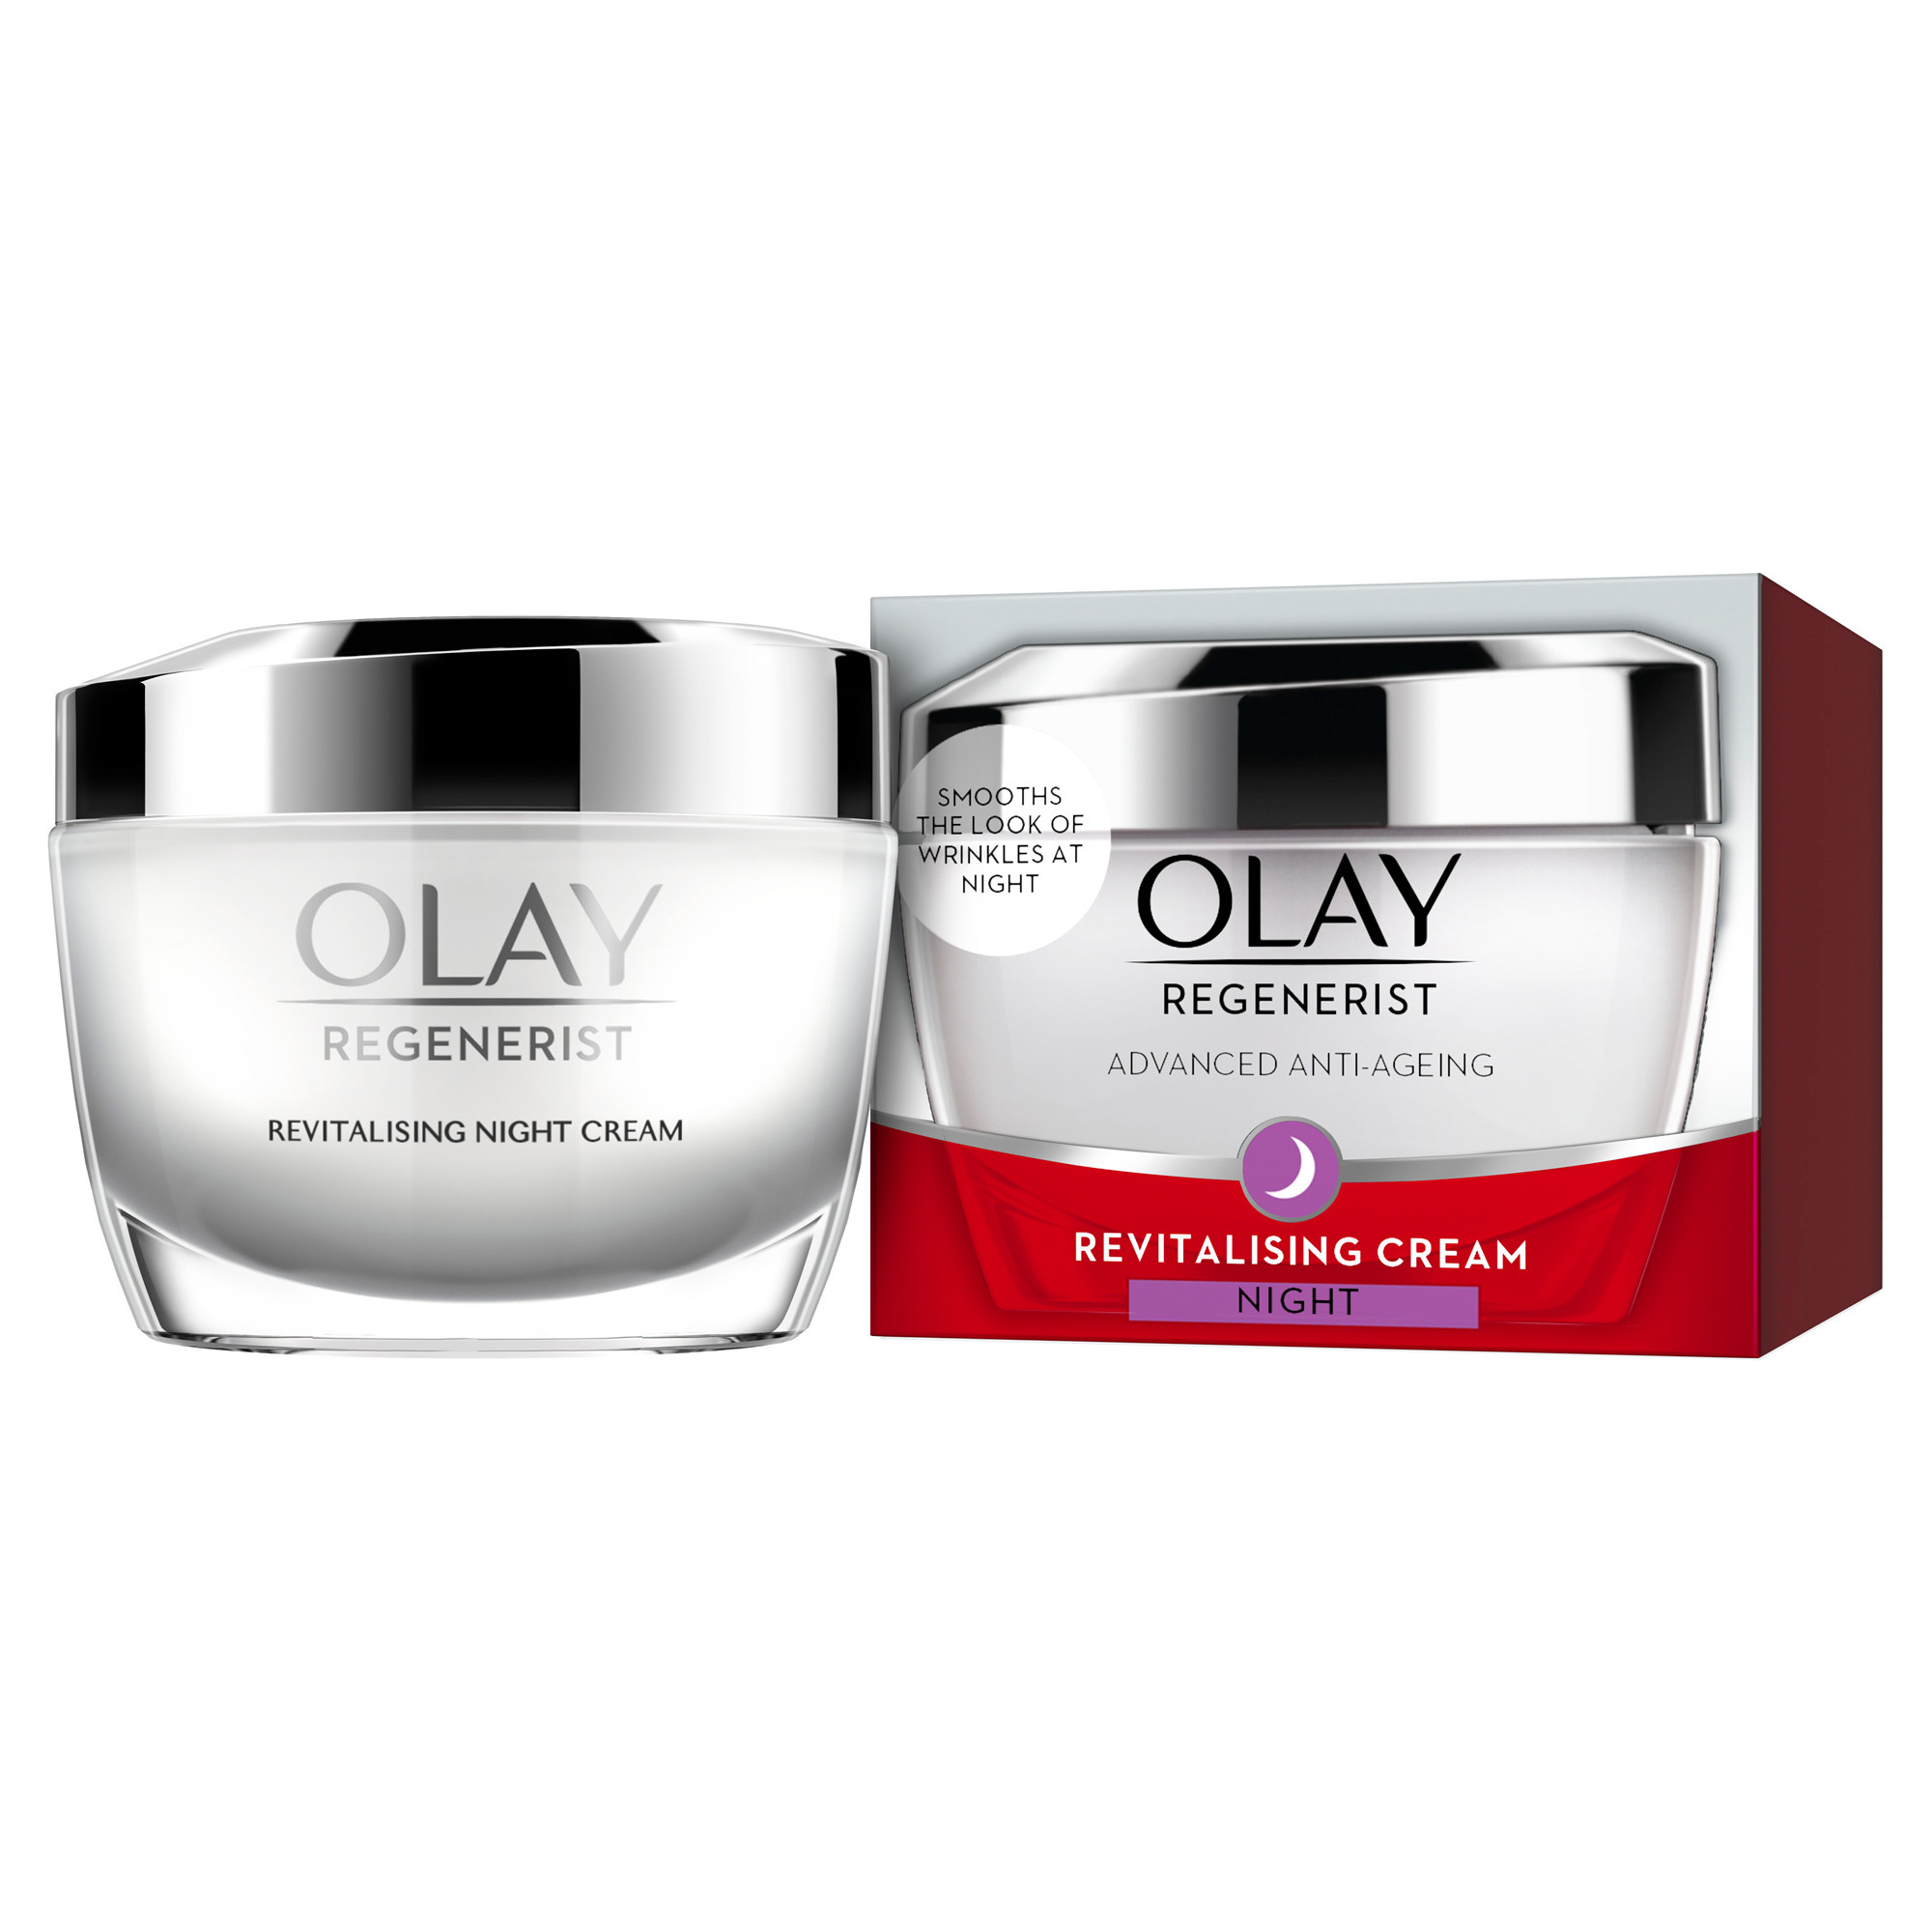 Olay Night Cream: Regenerist